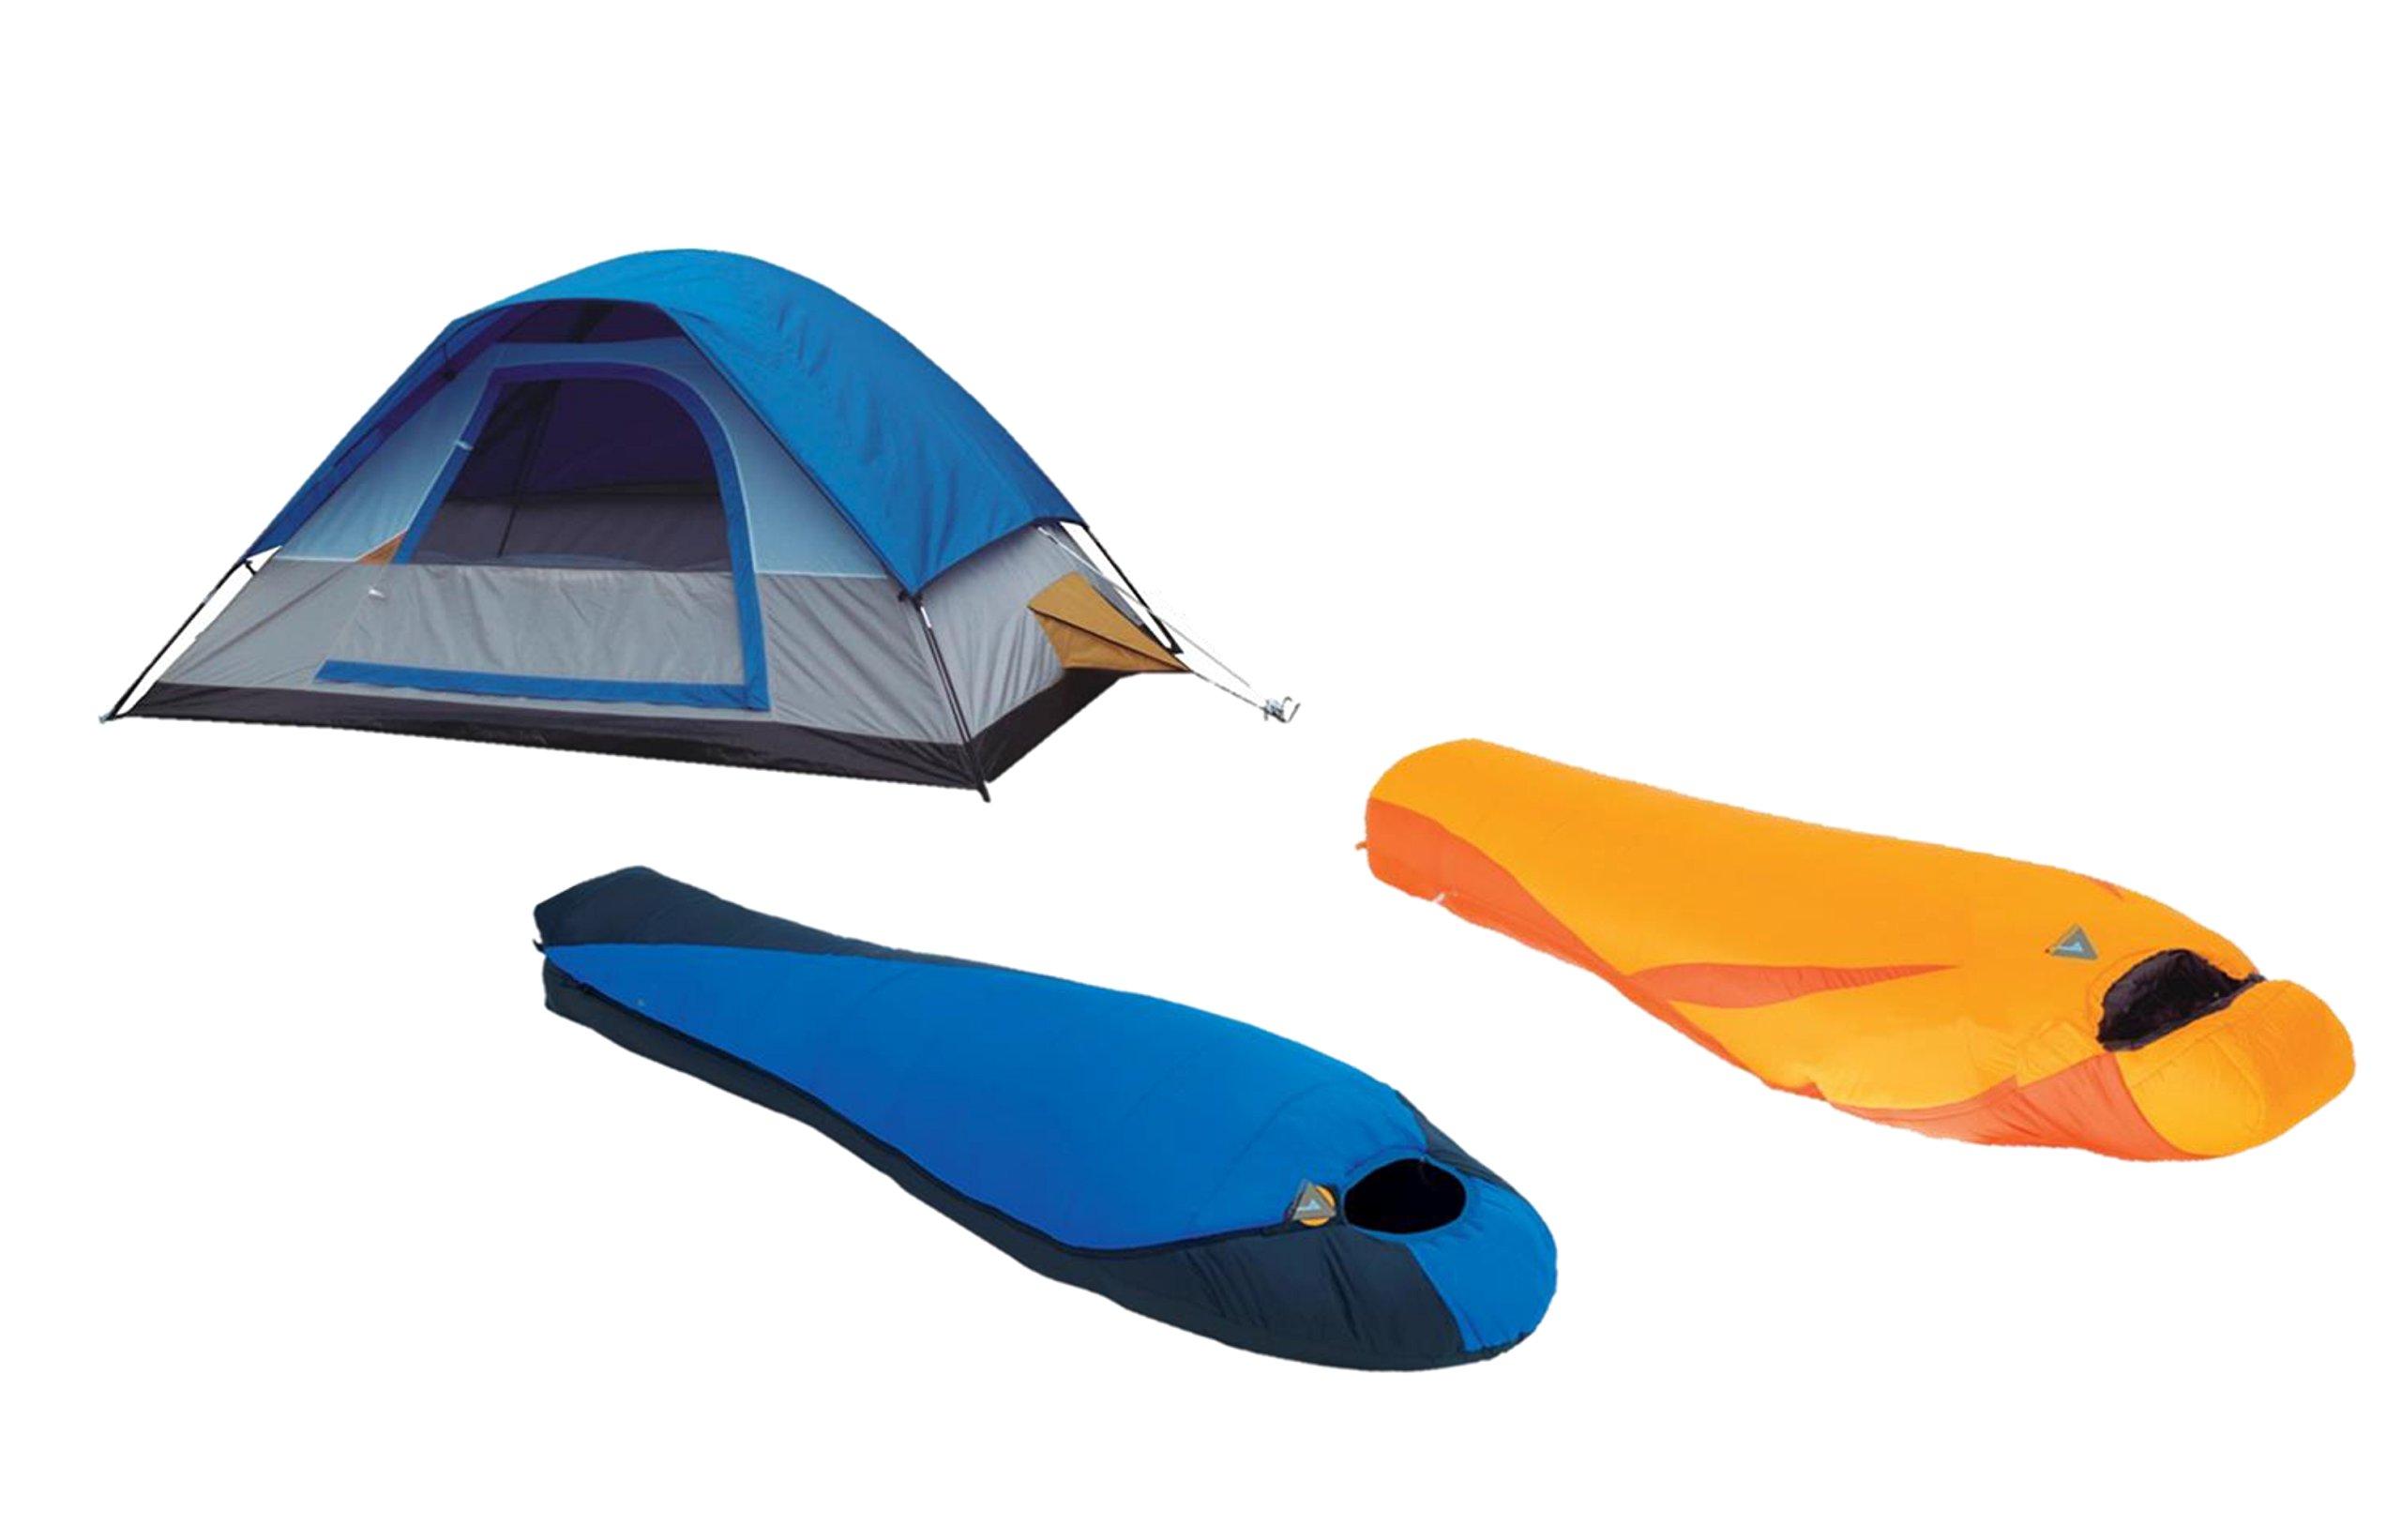 High Peak USA Alpinizmo Extreme Pak 0F & Latitude 20F Sleeping Bag with Tent Combo Set, One Size, Blue/Orange by Alpinizmo